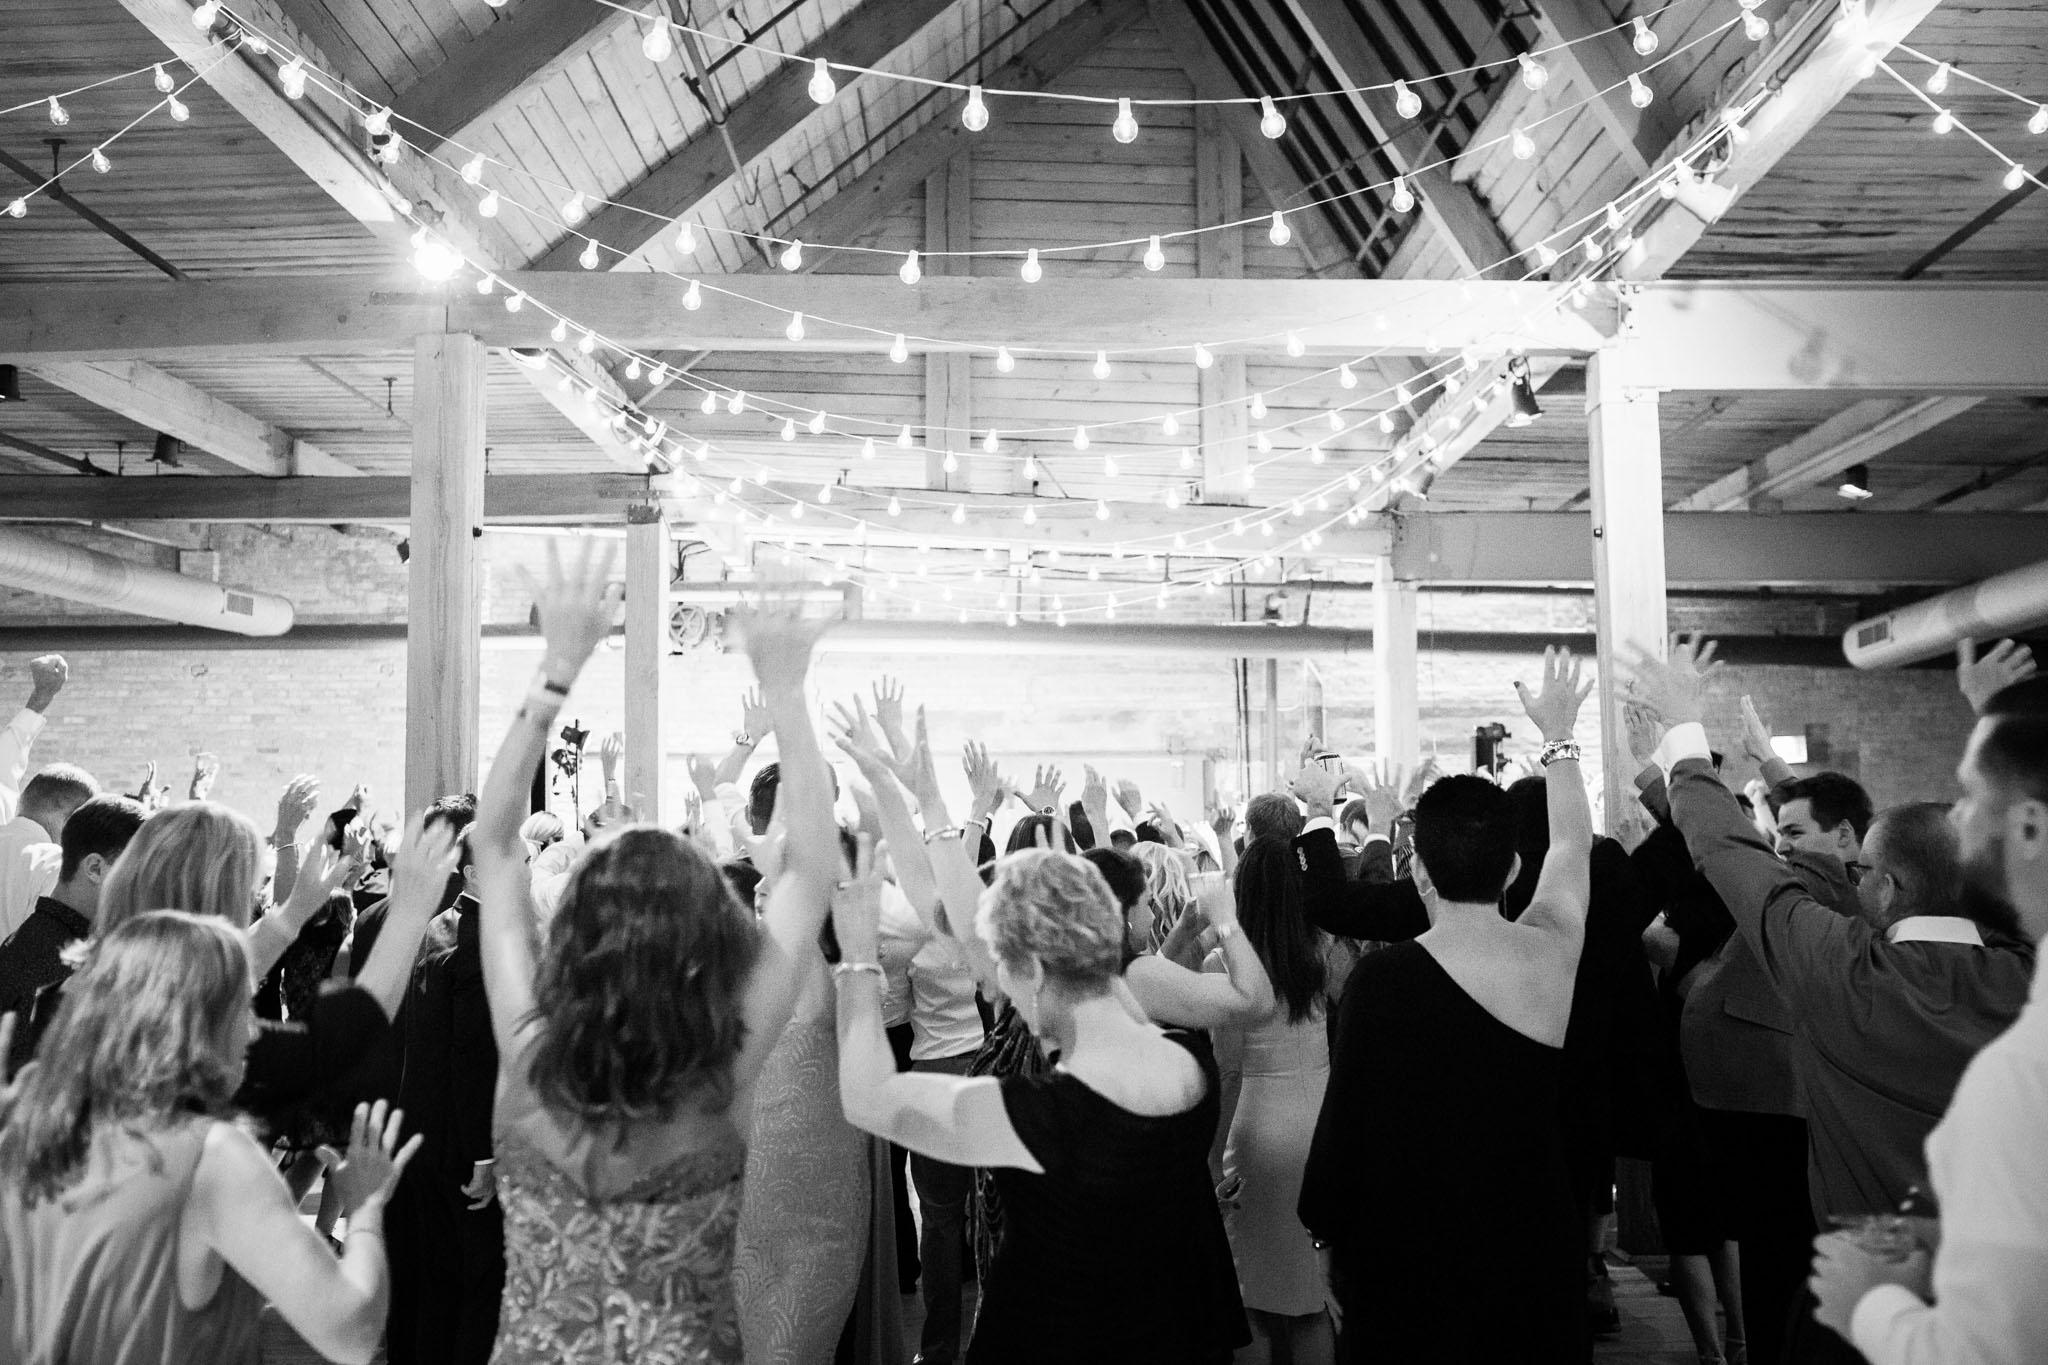 bridgeport-art-center-wedding-photos-44.jpg